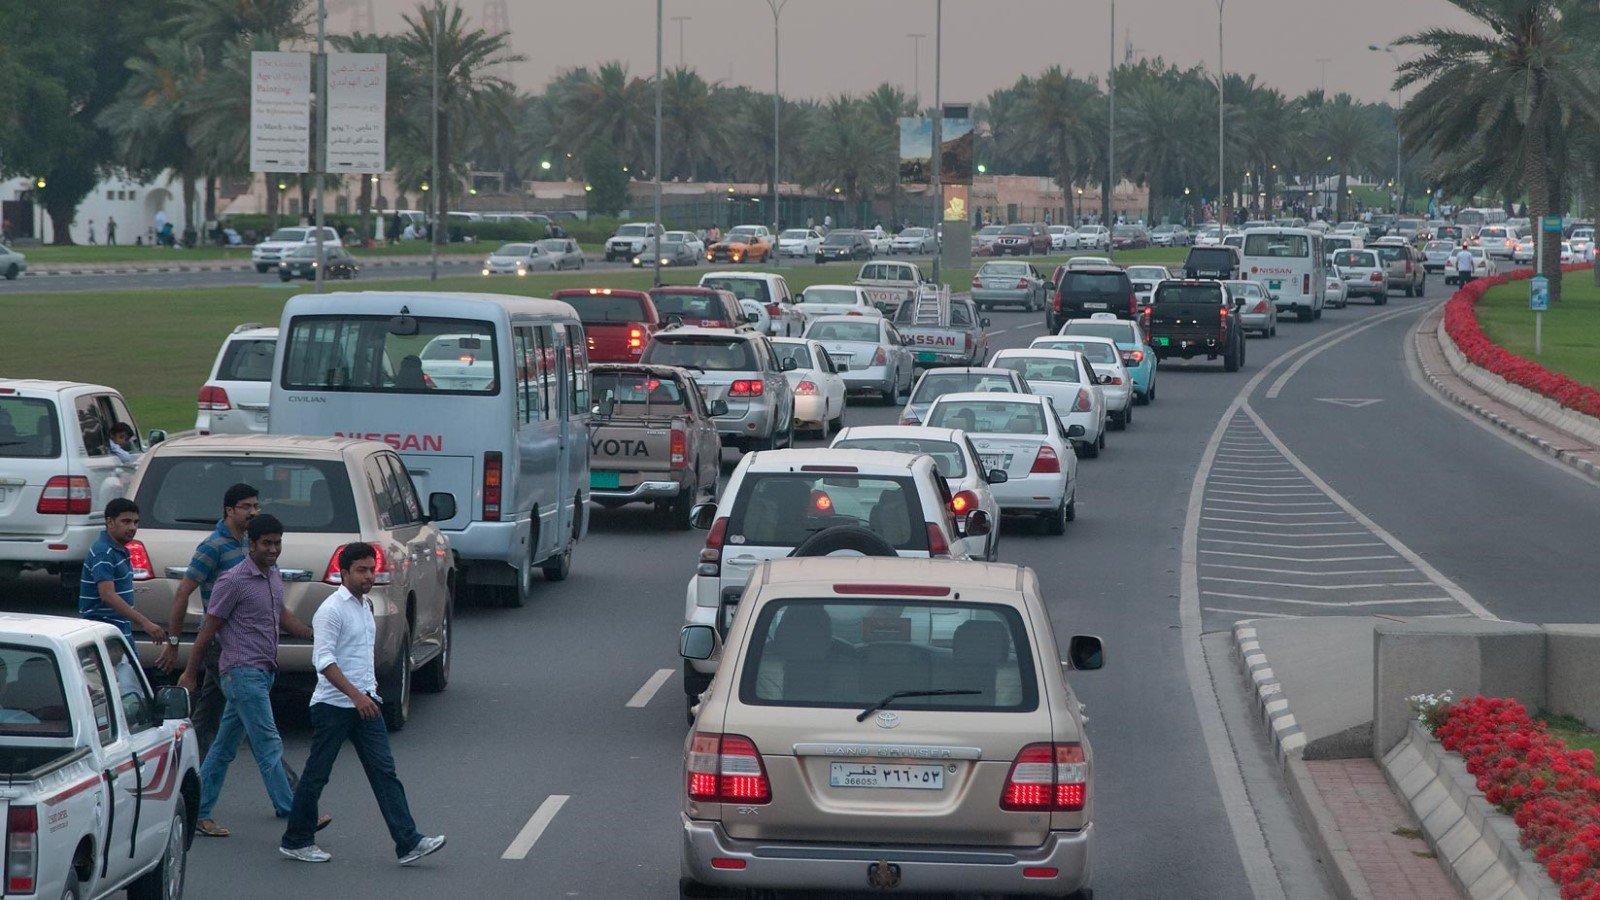 Banbury-based StarTraq awarded traffic enforcement solution contract in Qatar